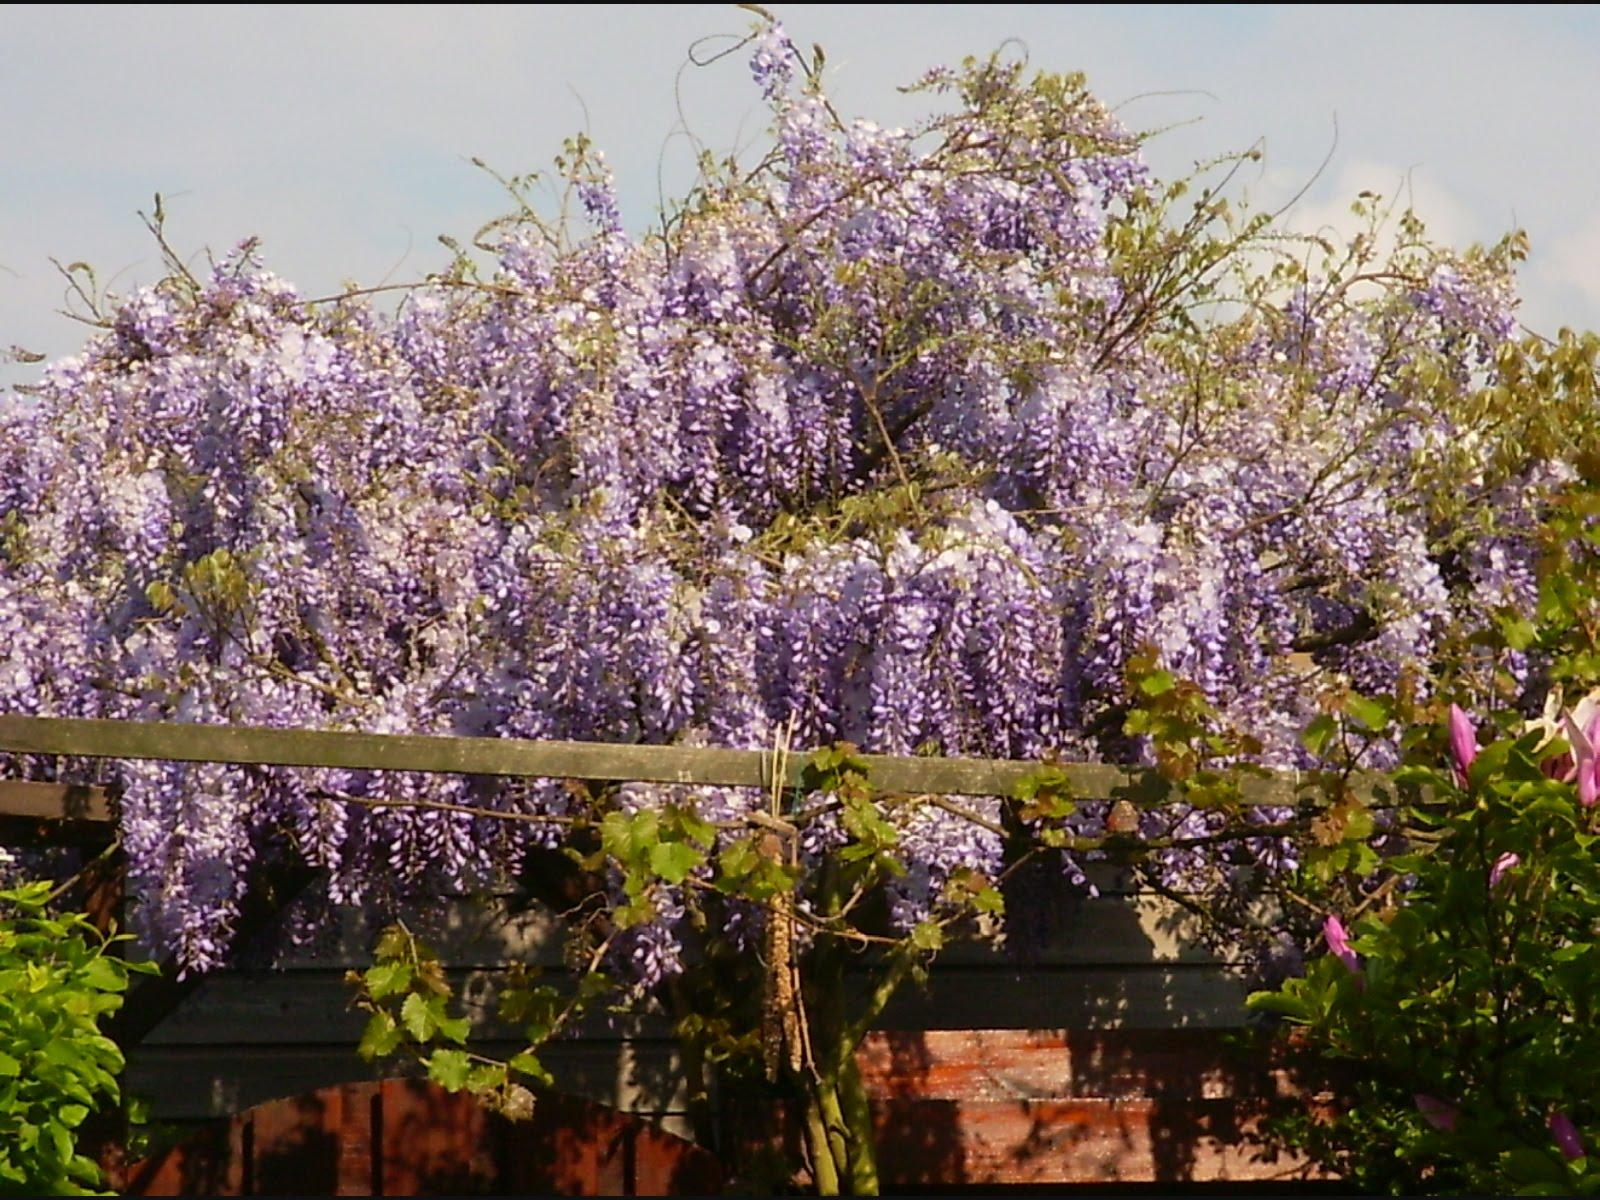 Tuinweetjes pergola begroeide boog in tuinen - Pergola klimplant ...